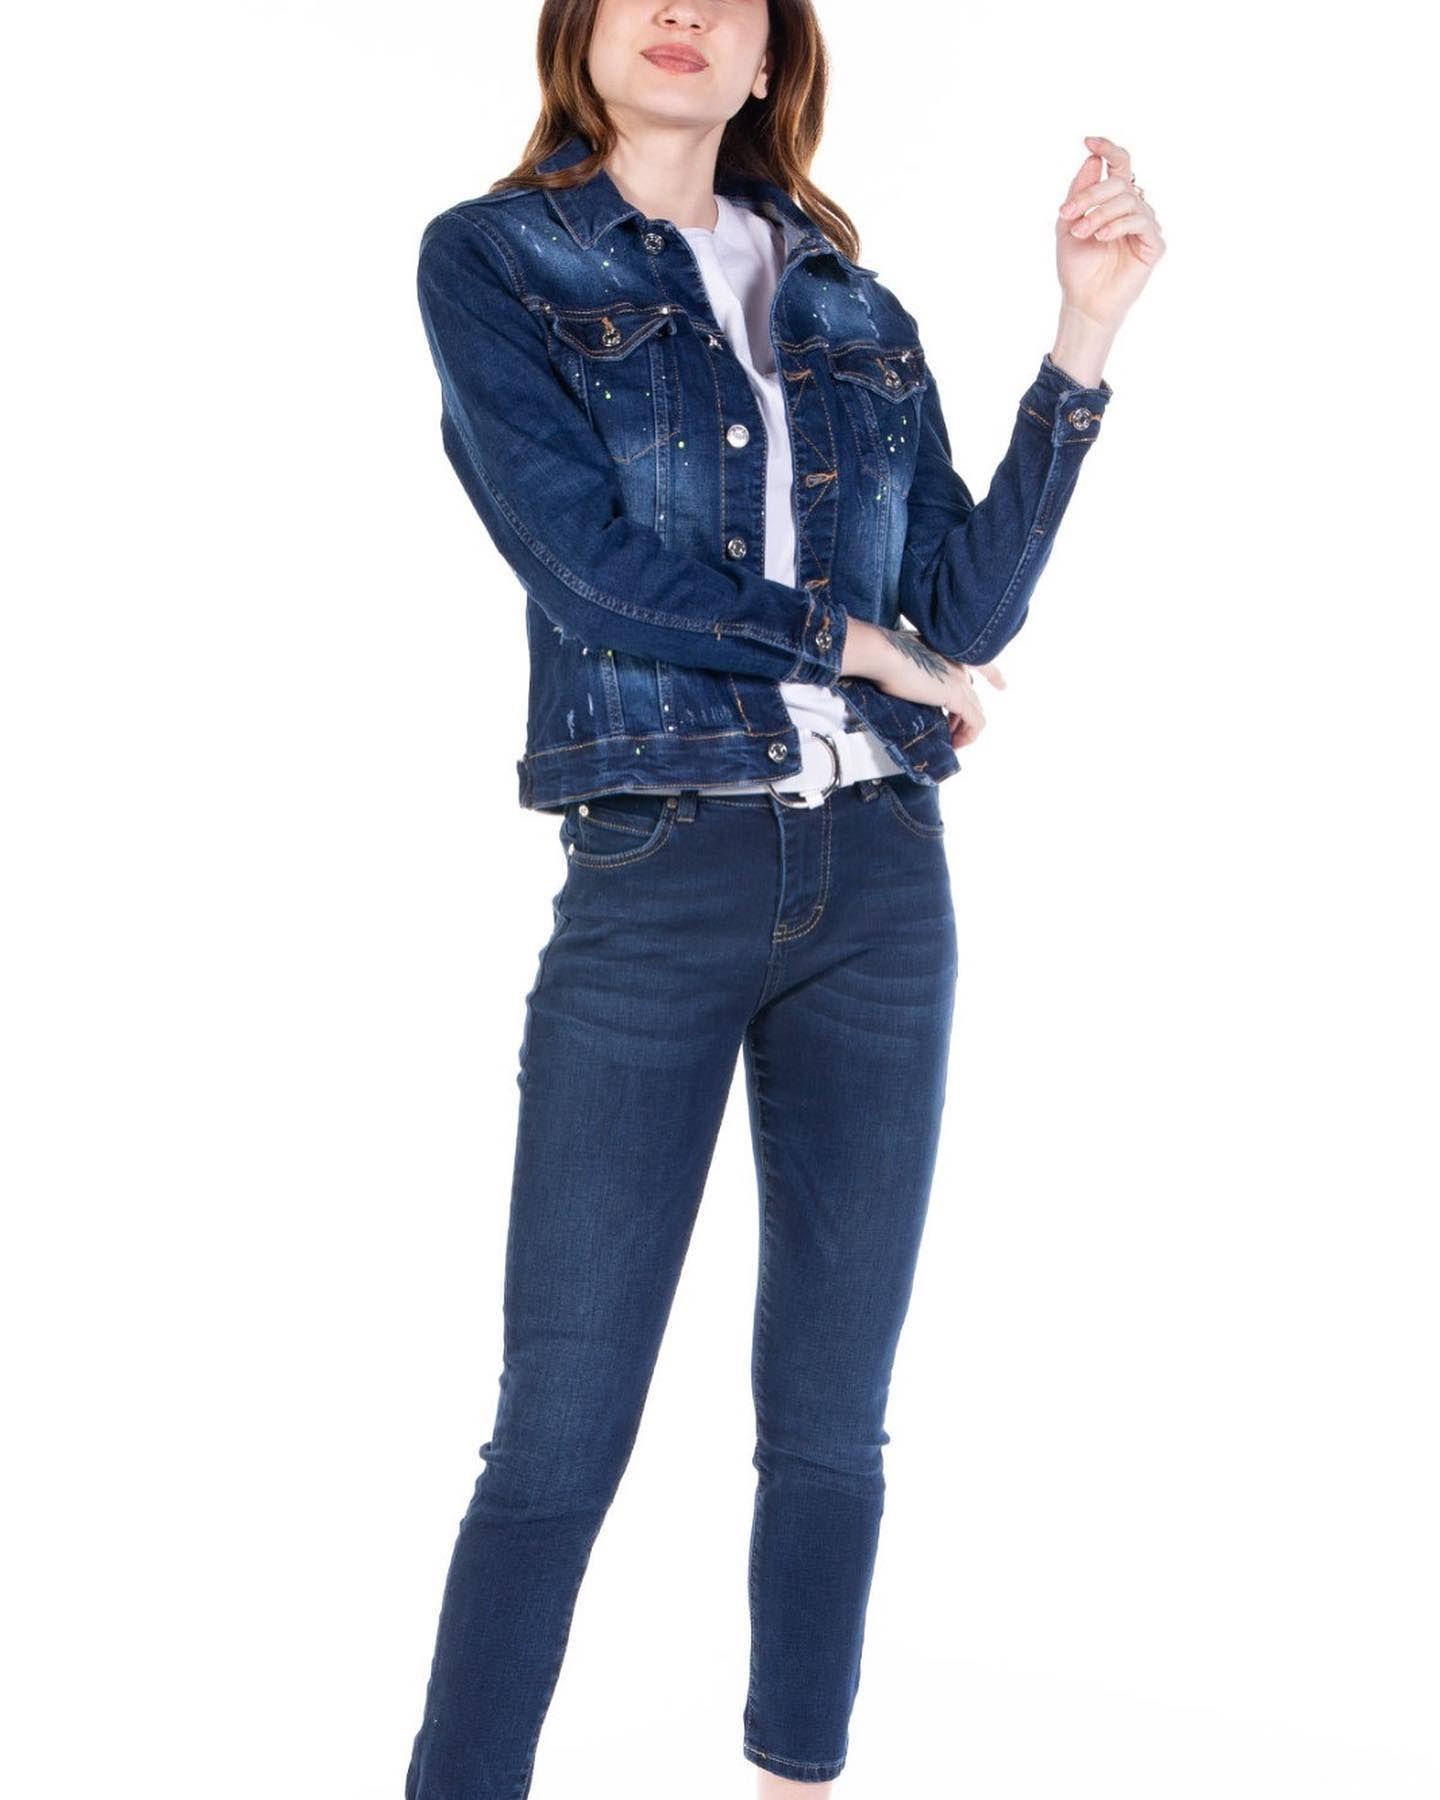 Arkasi Baskili Boyali Kot Ceket Urun Kodu Vkng71912 Urun Fiyati 129 95 Vikingjeans Vikingjeanswoman Trendyol Hepsi In 2020 Fashion Women Jeans Levi Jeans